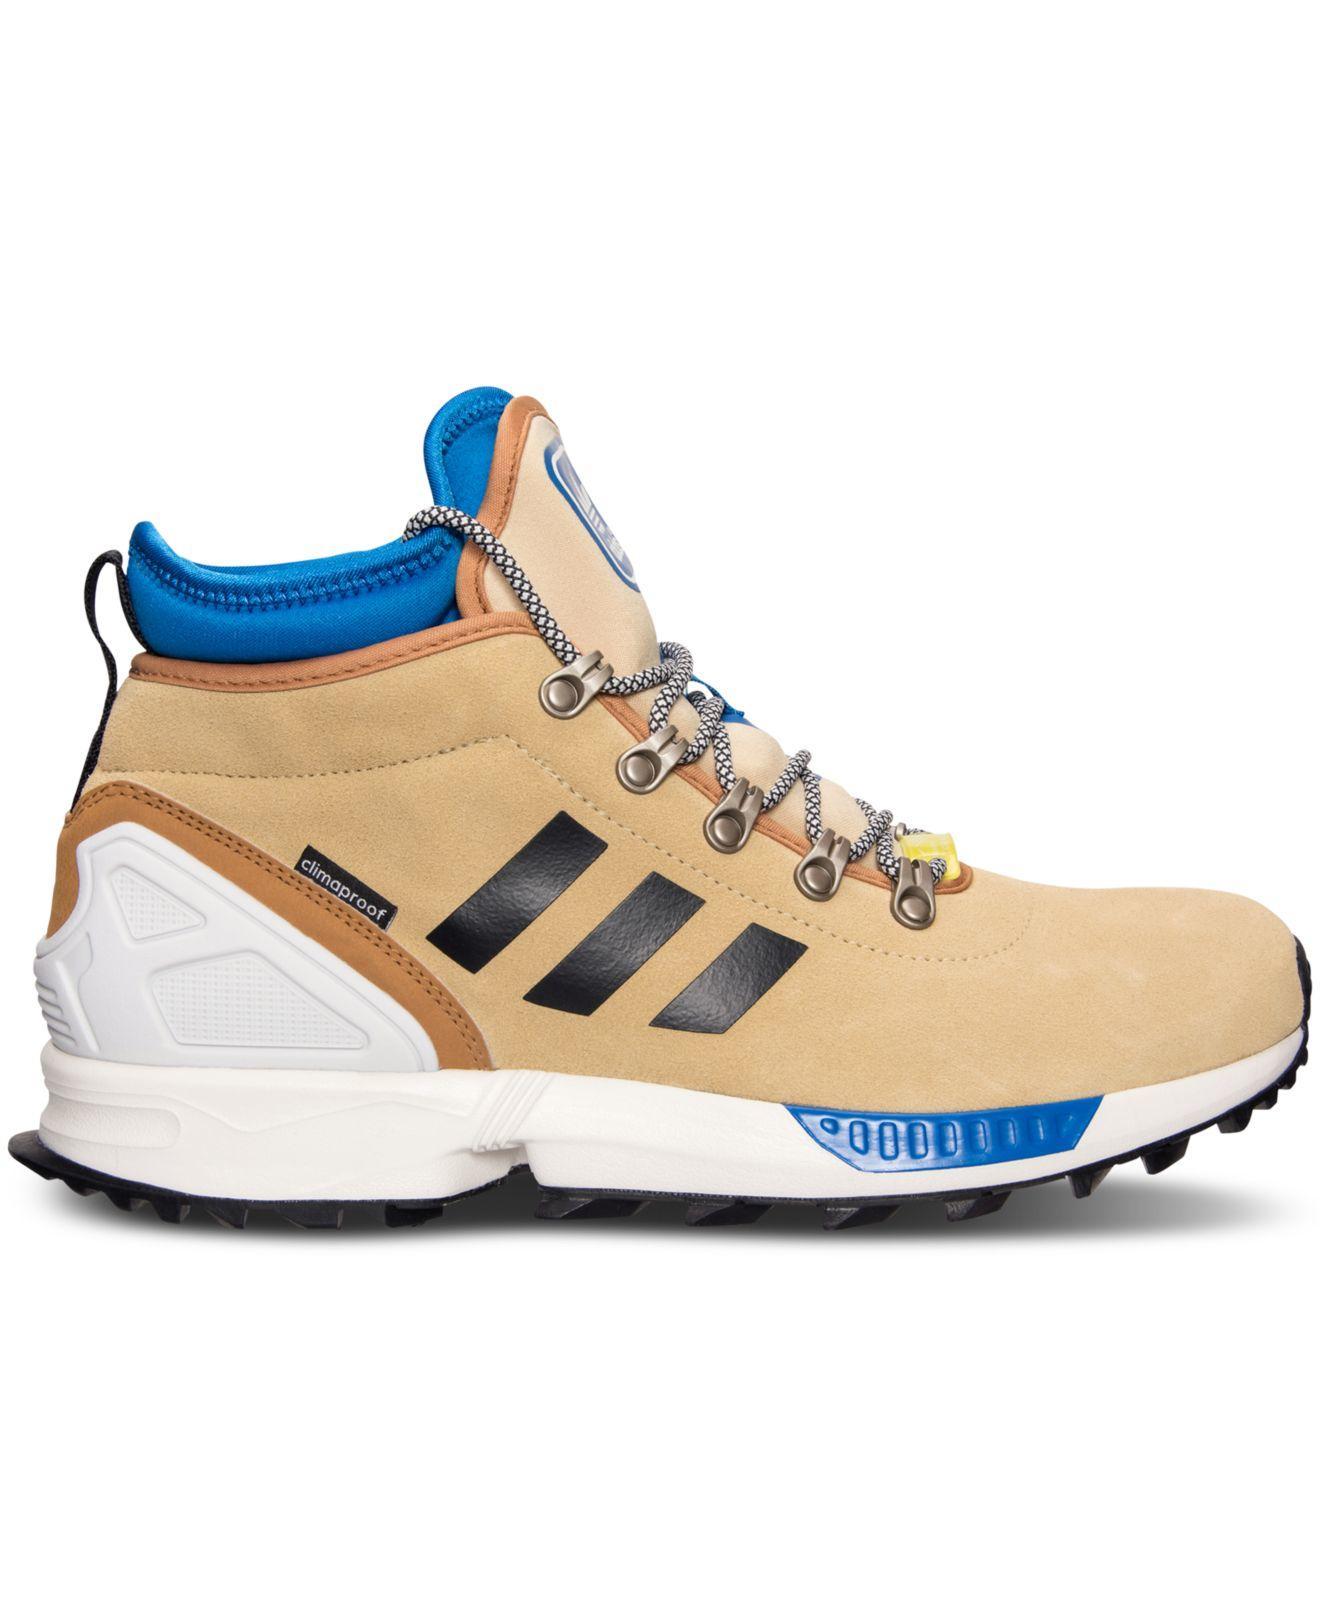 fb16fcfa96 adidas Men's Originals Zx Flux Winter Sneakerboots From Finish Line ...